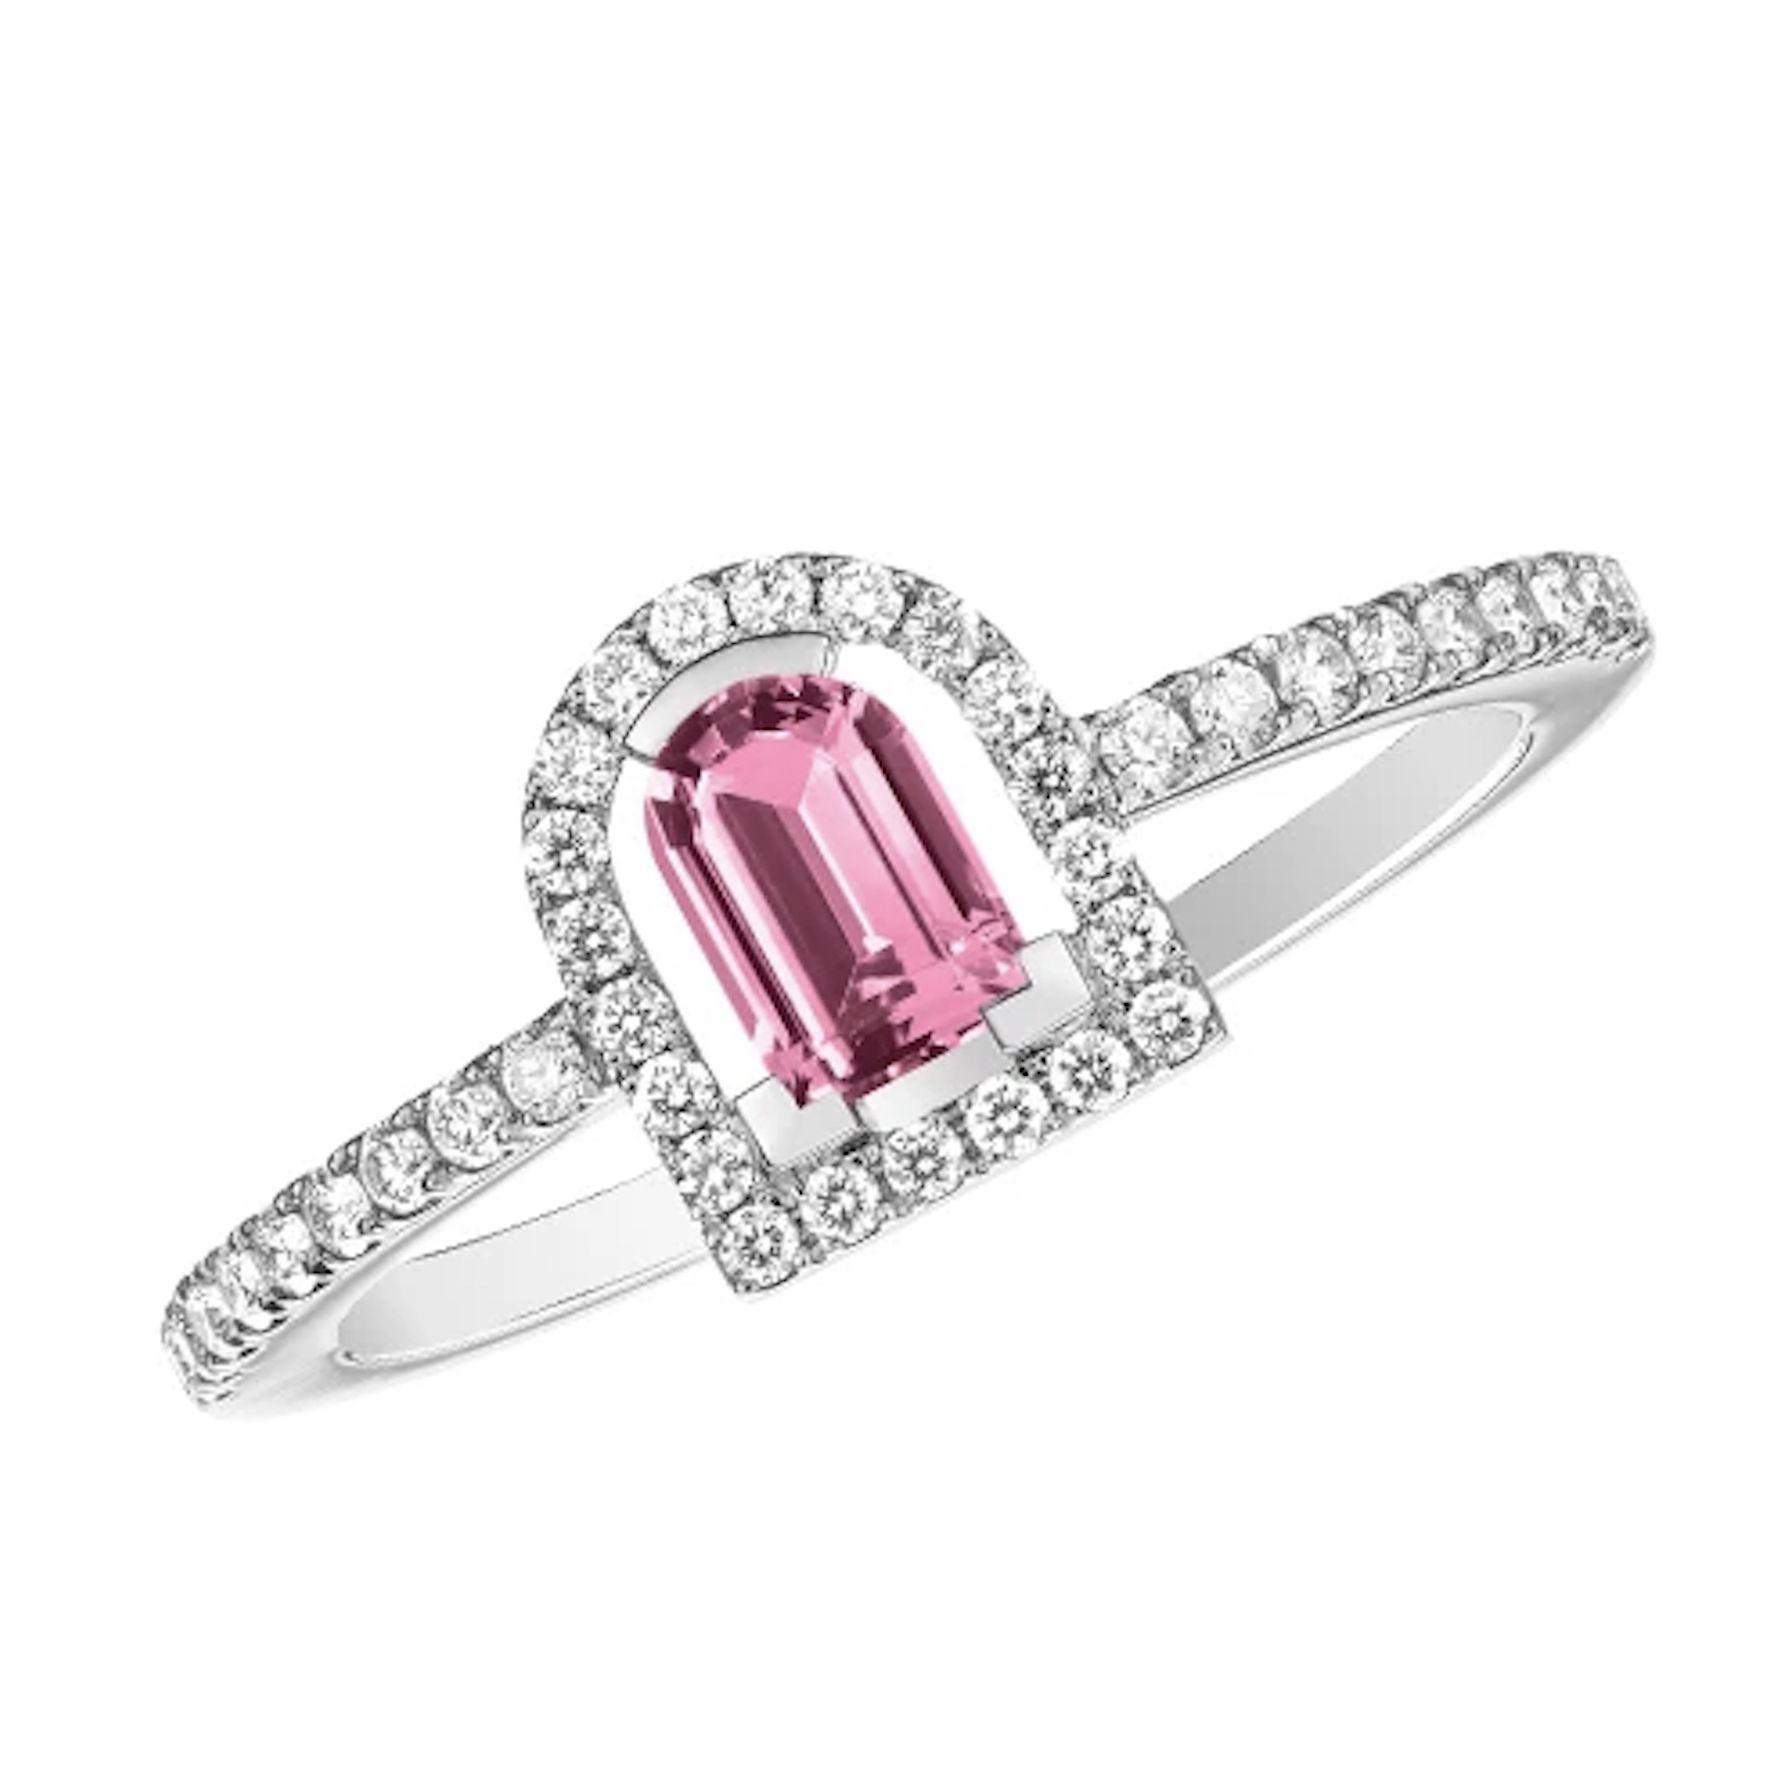 DAVIDOR ring